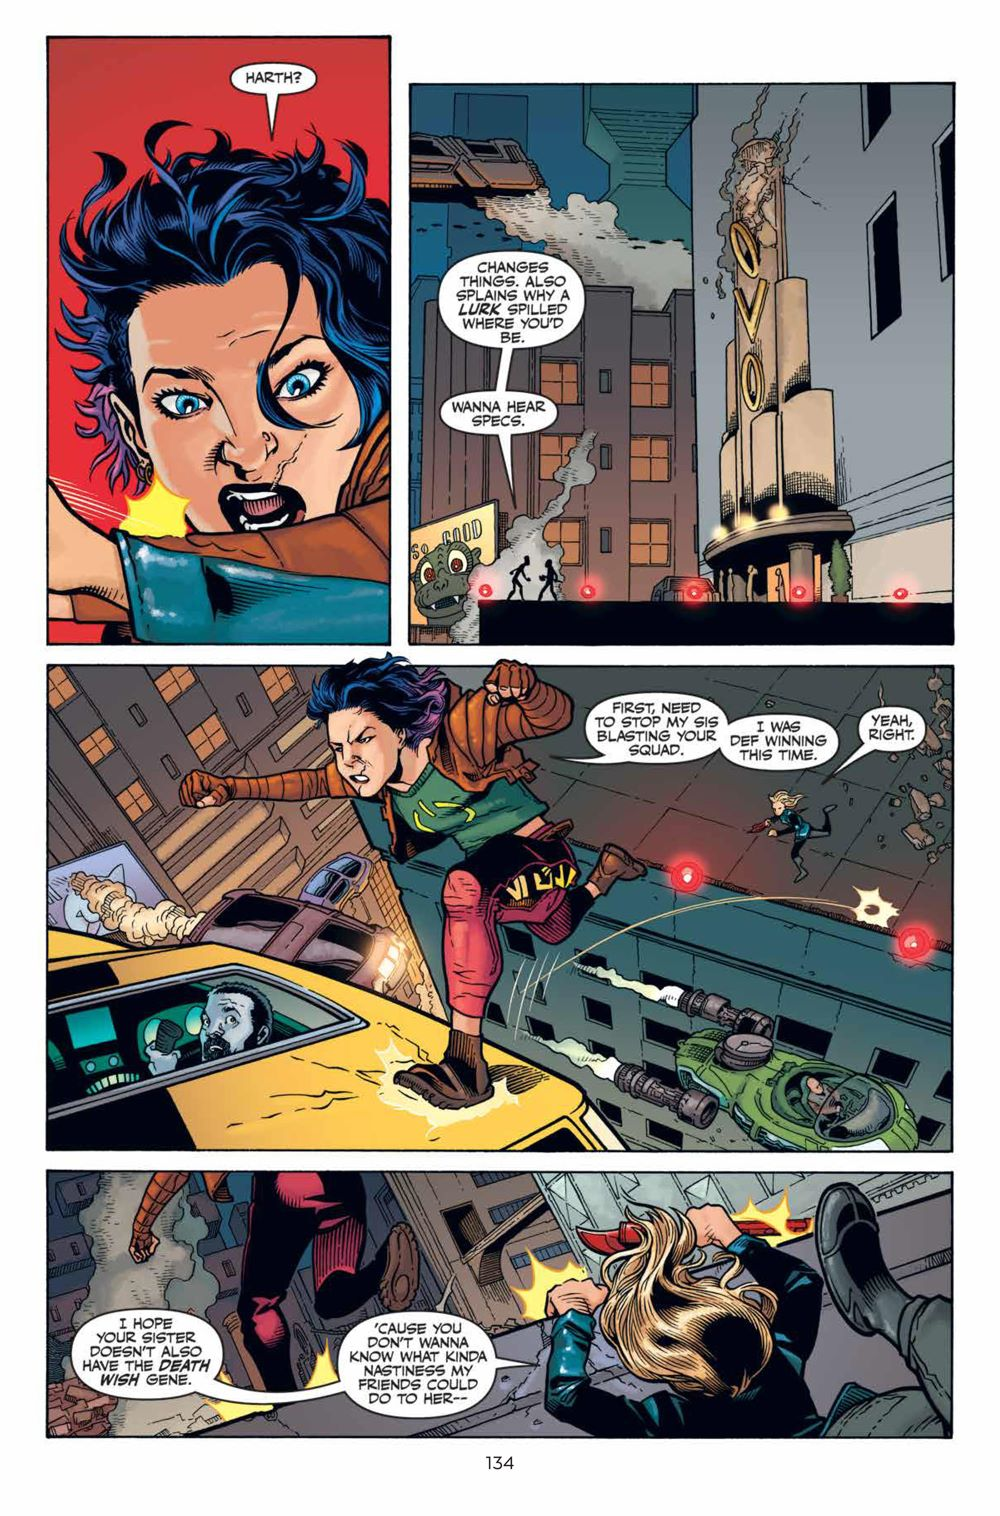 Buffy_Season12_HC_PRESS_138 ComicList Previews: BUFFY THE VAMPIRE SLAYER SEASON 12 LIBRARY EDITION VOLUME 1 HC